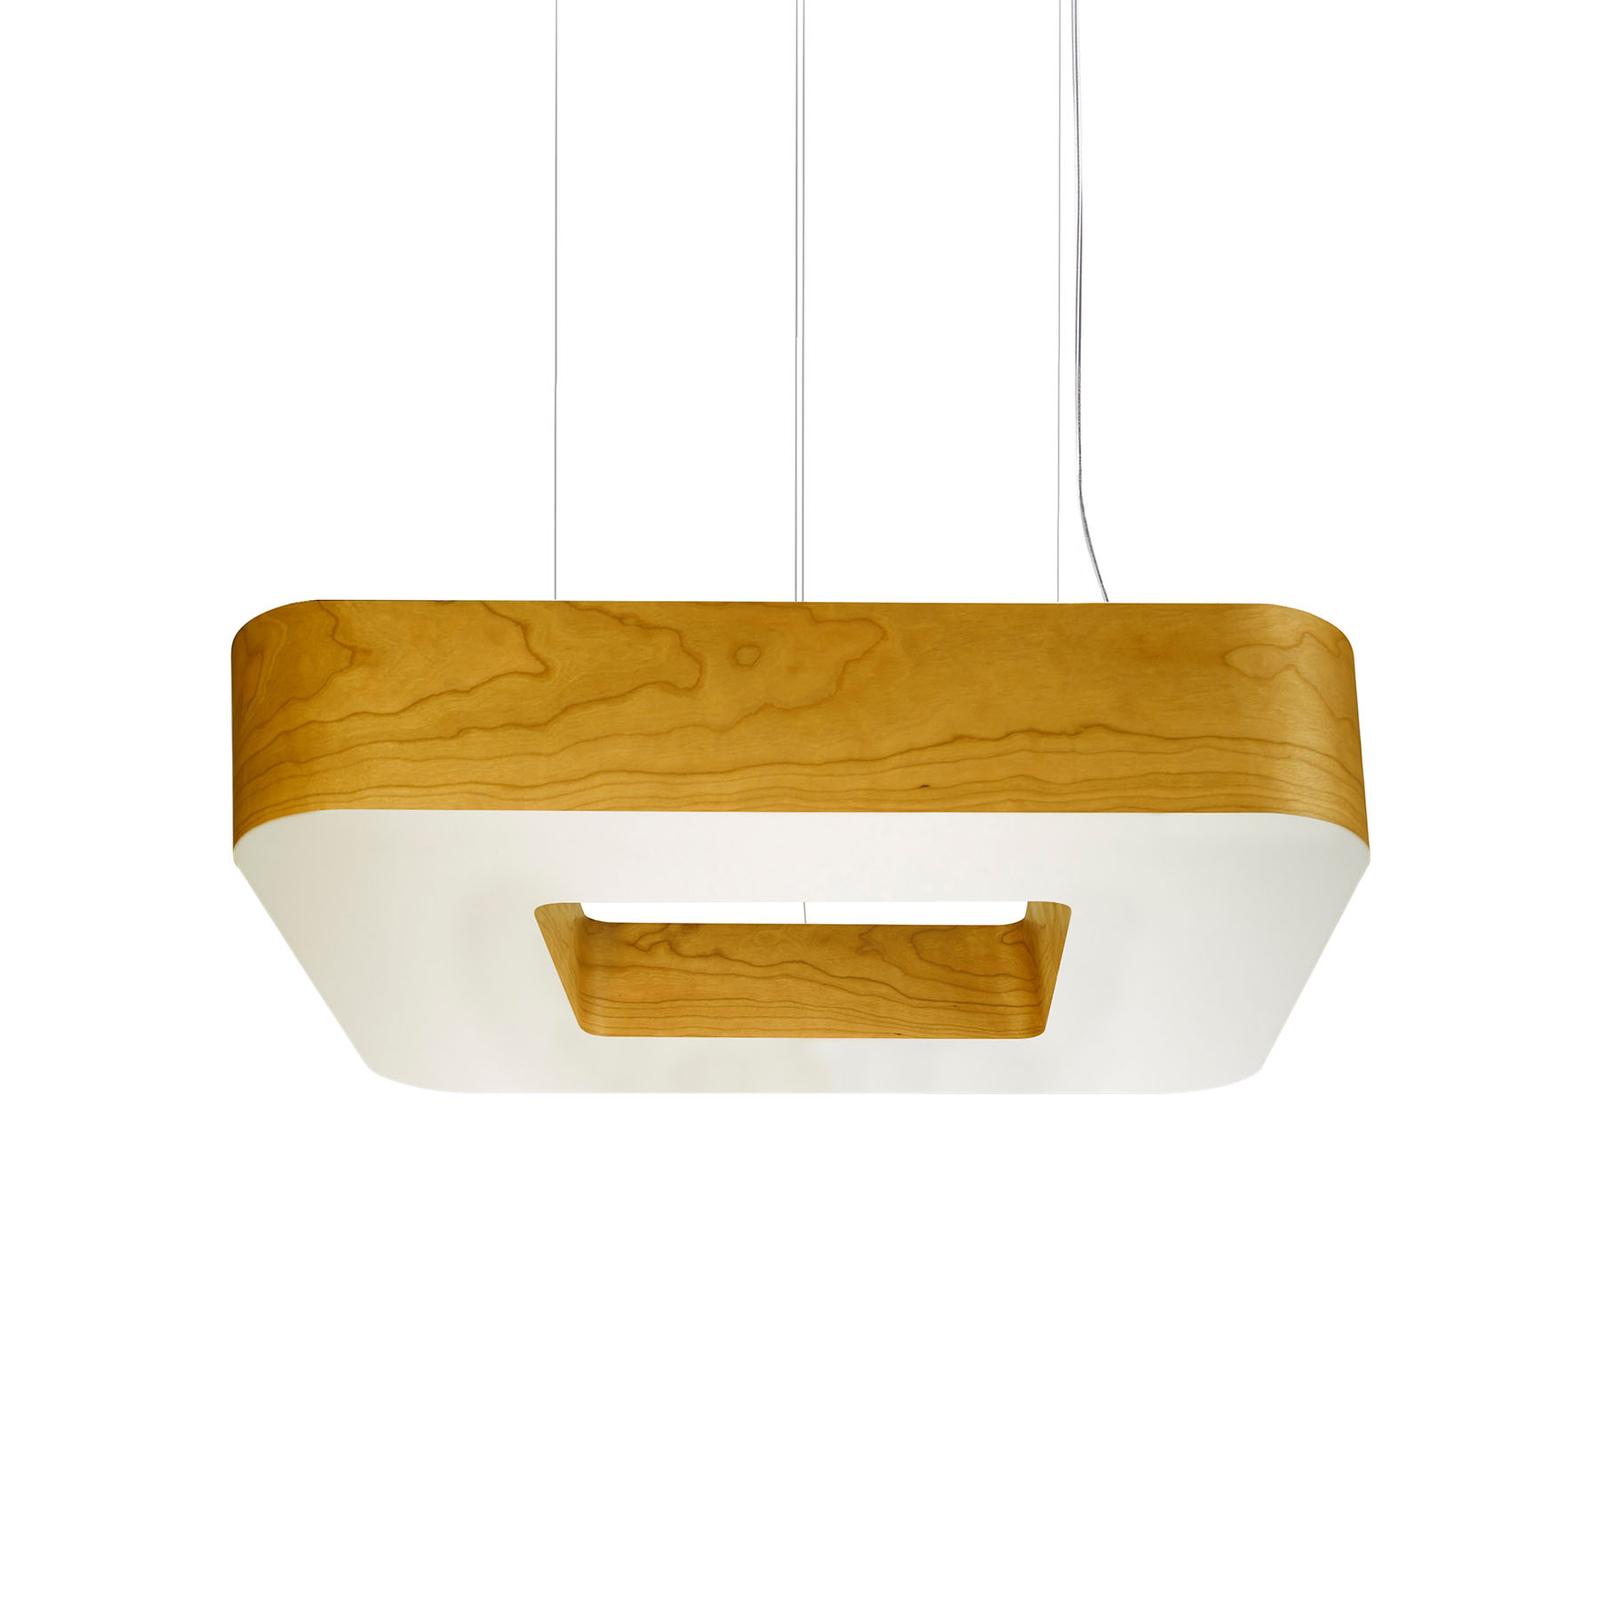 LZF Cuad LED-Hängeleuchte 0-10V dim, gelb